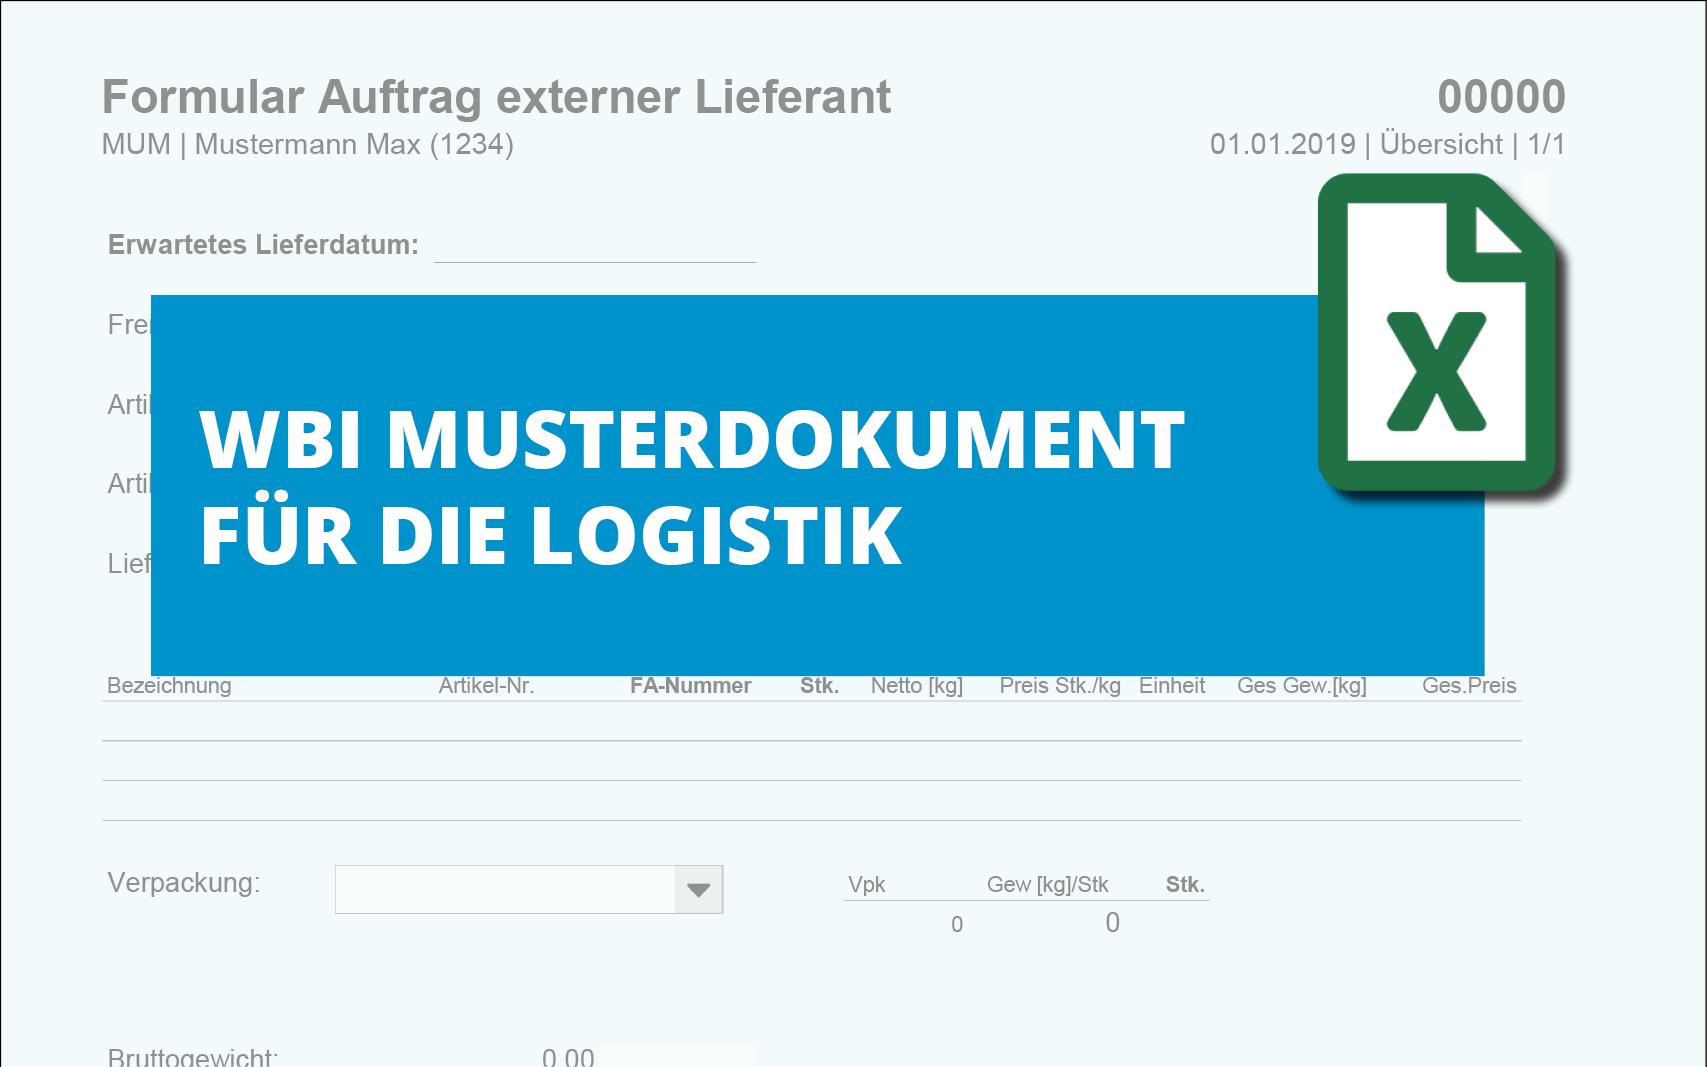 formular-auftrag-externer-lieferant